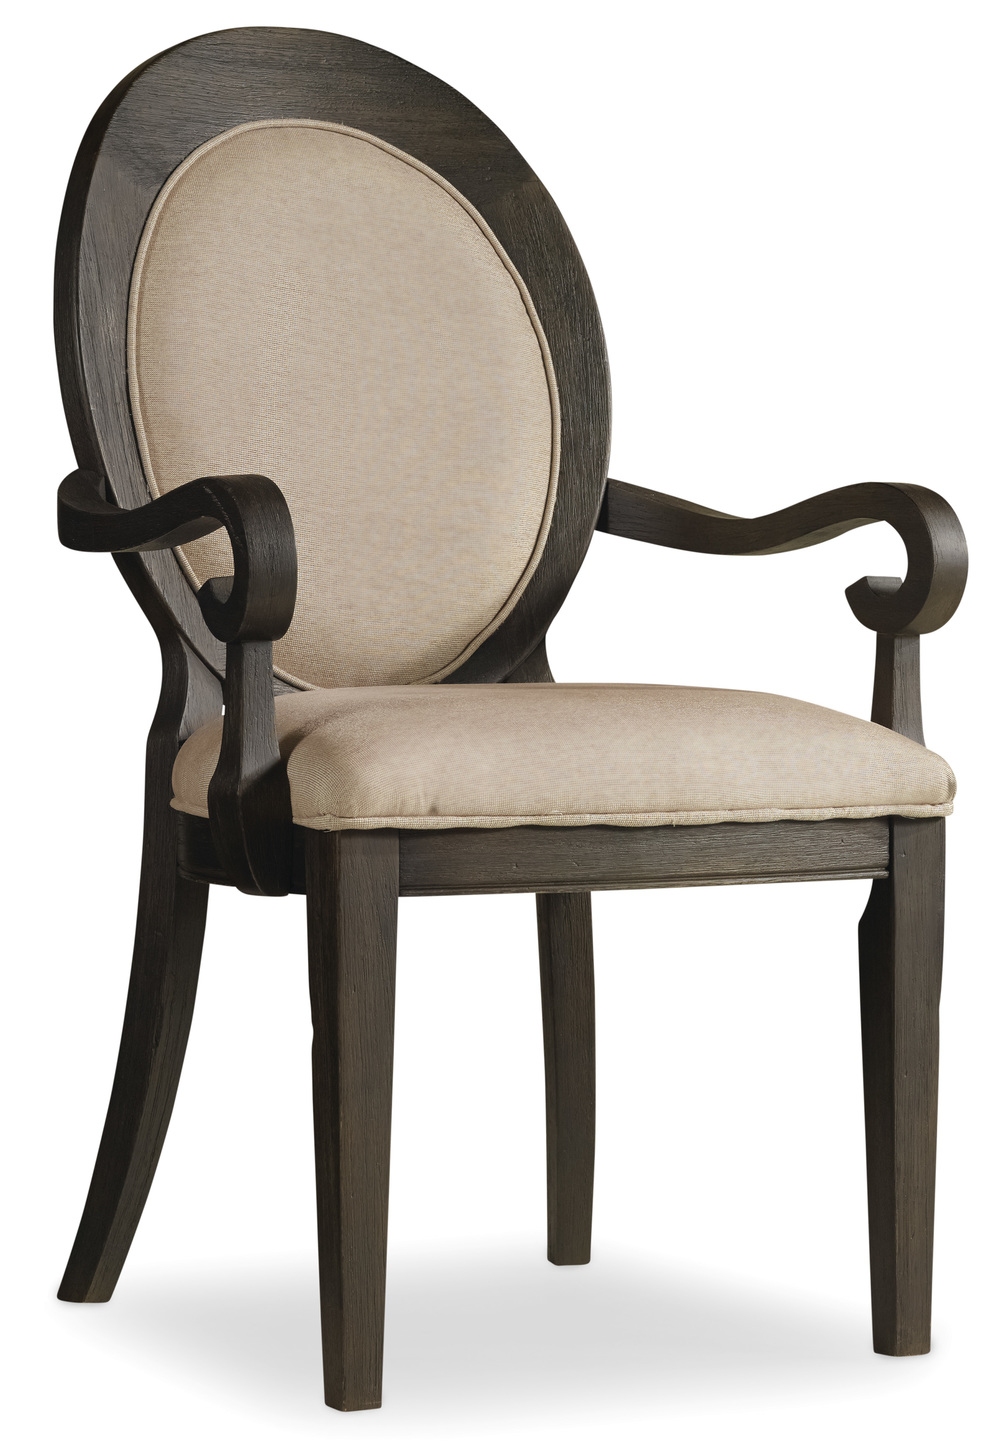 Hooker Furniture - Corsica Dark Oval Back Arm Chair